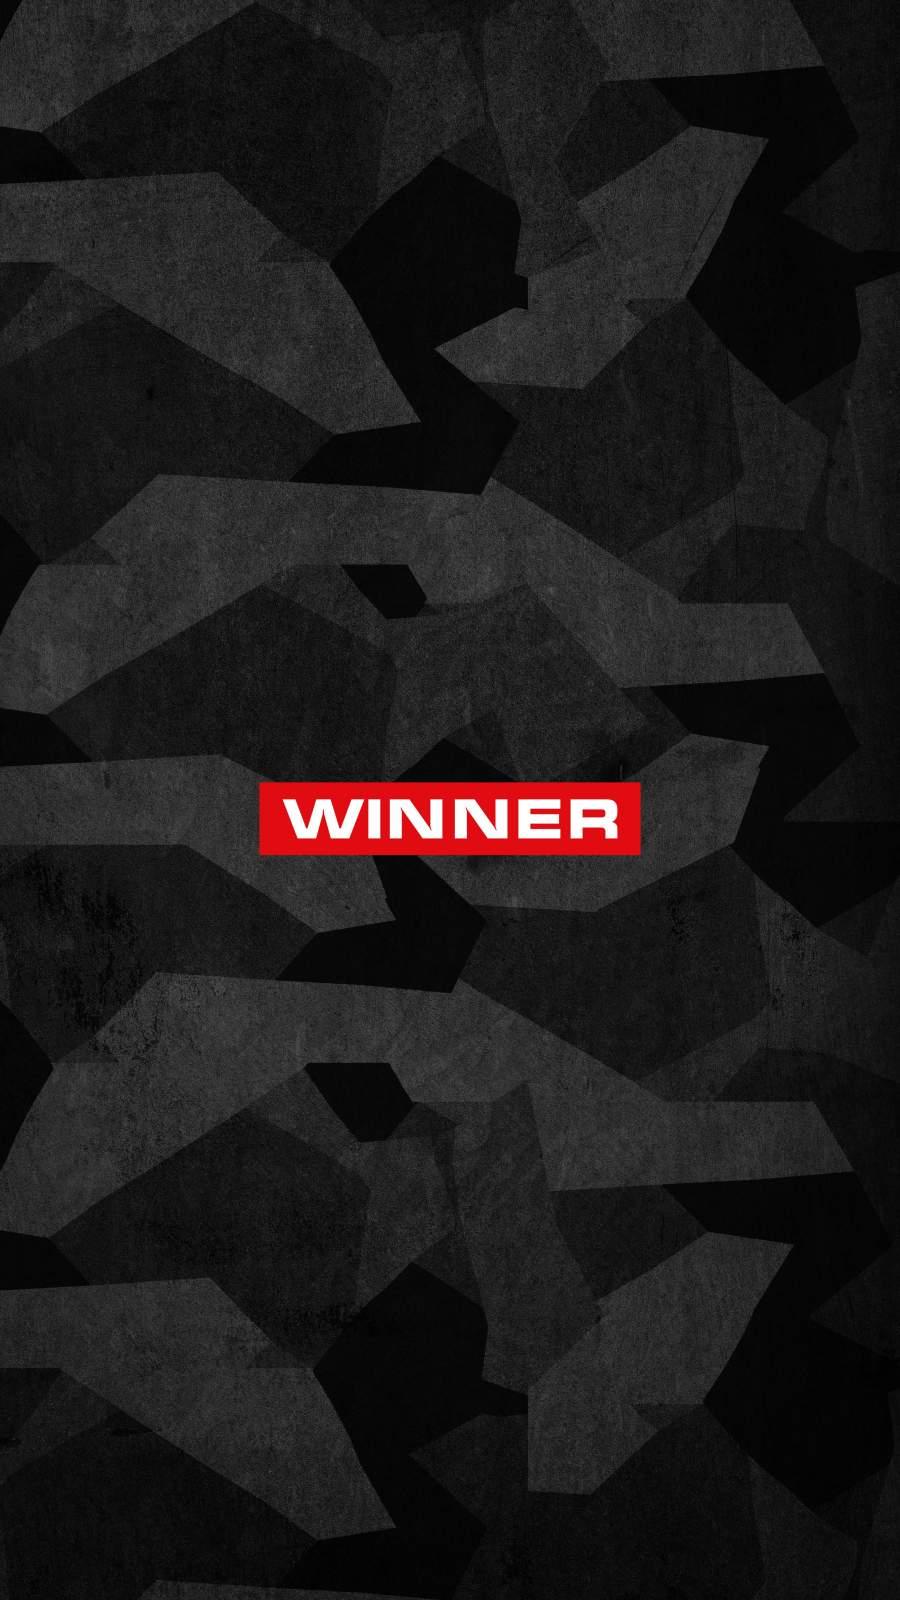 Winner iPhone Wallpaper